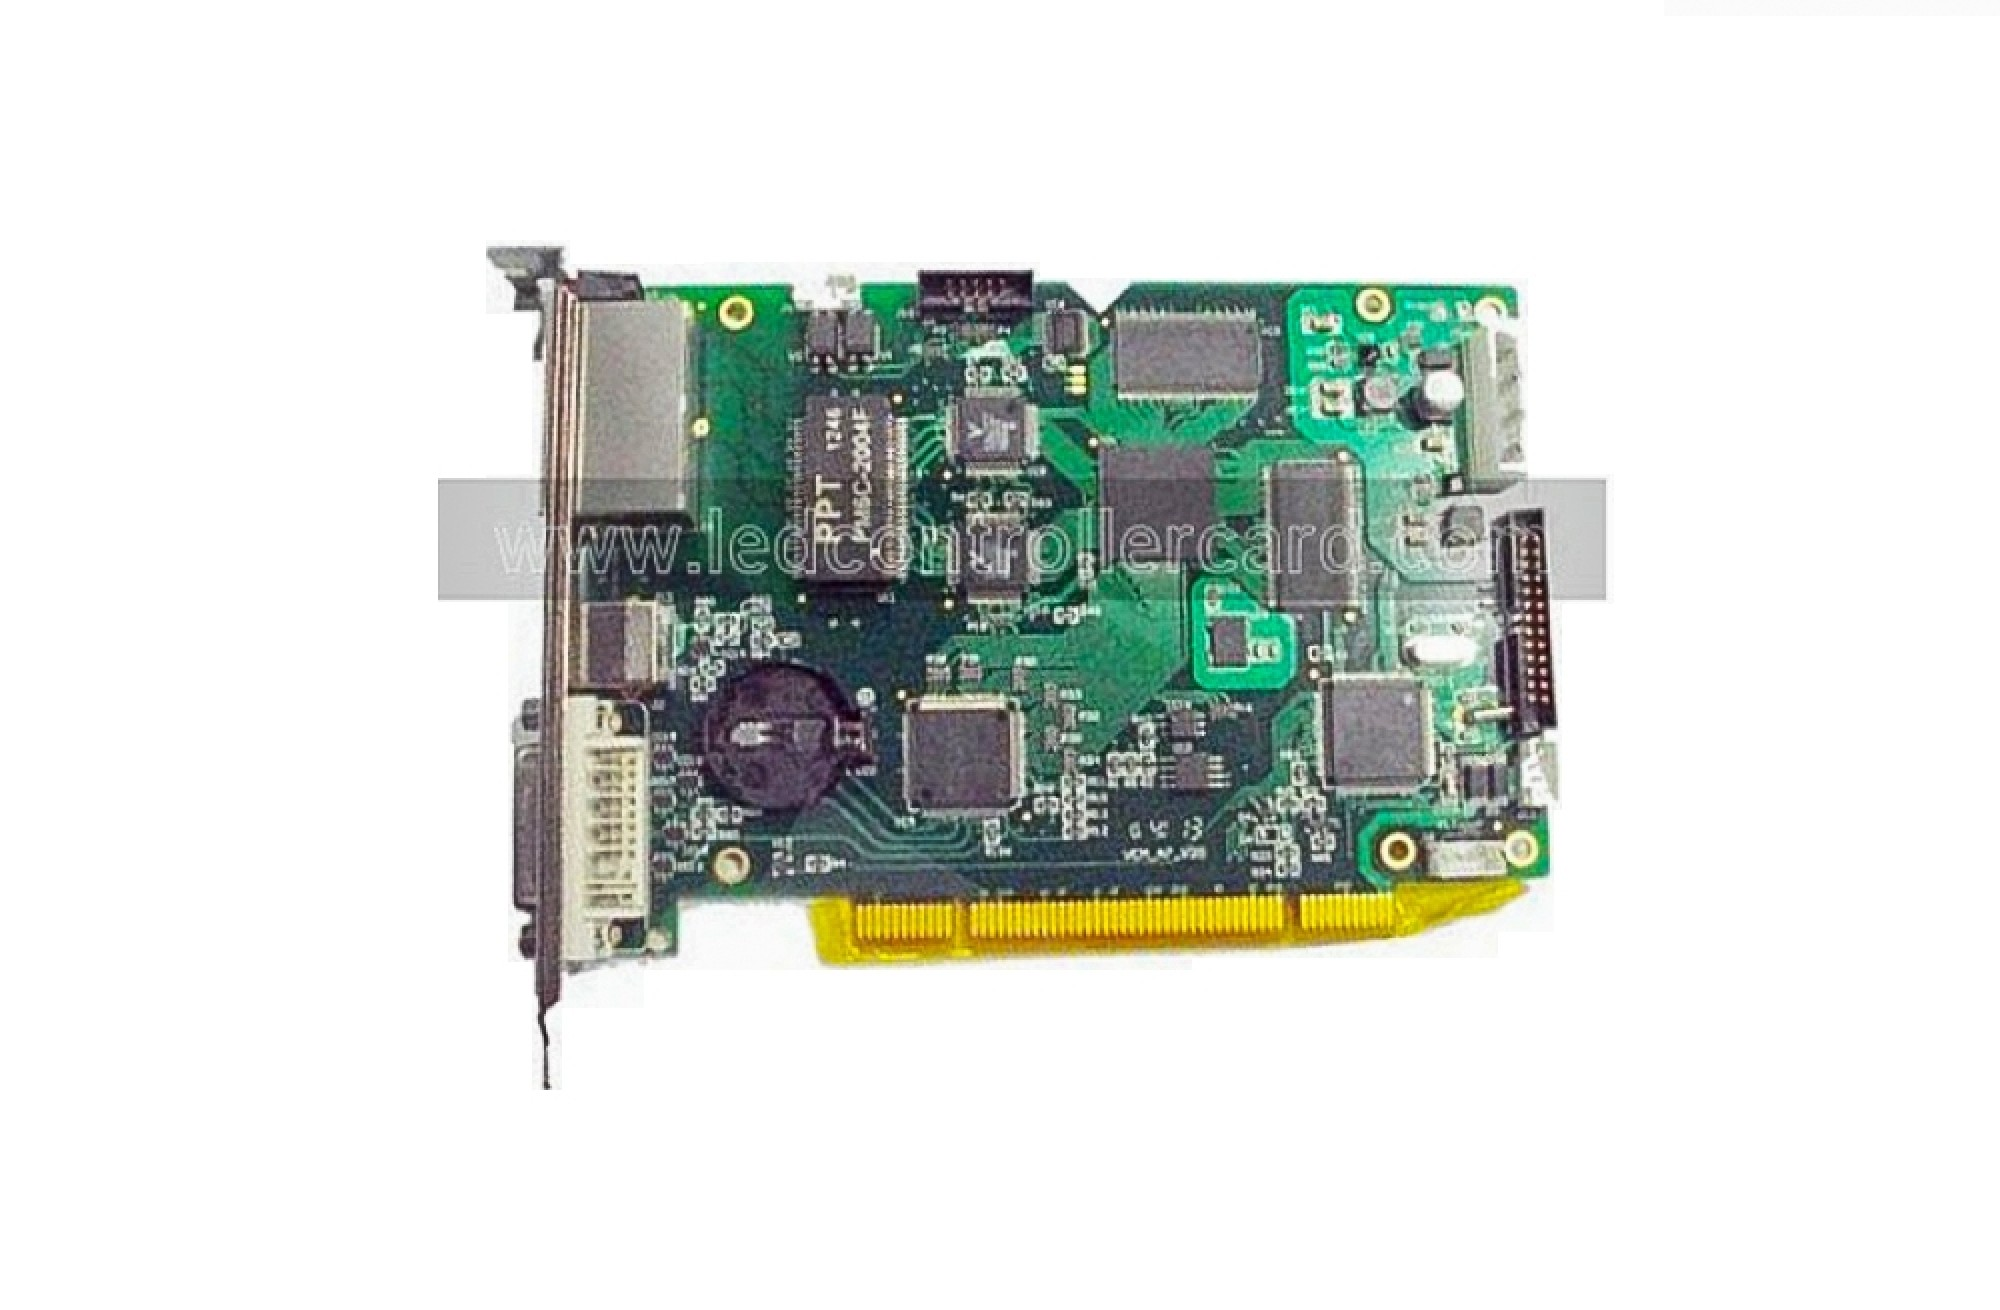 Mooncell VCMA7-V20 LED Display Sender Control Card